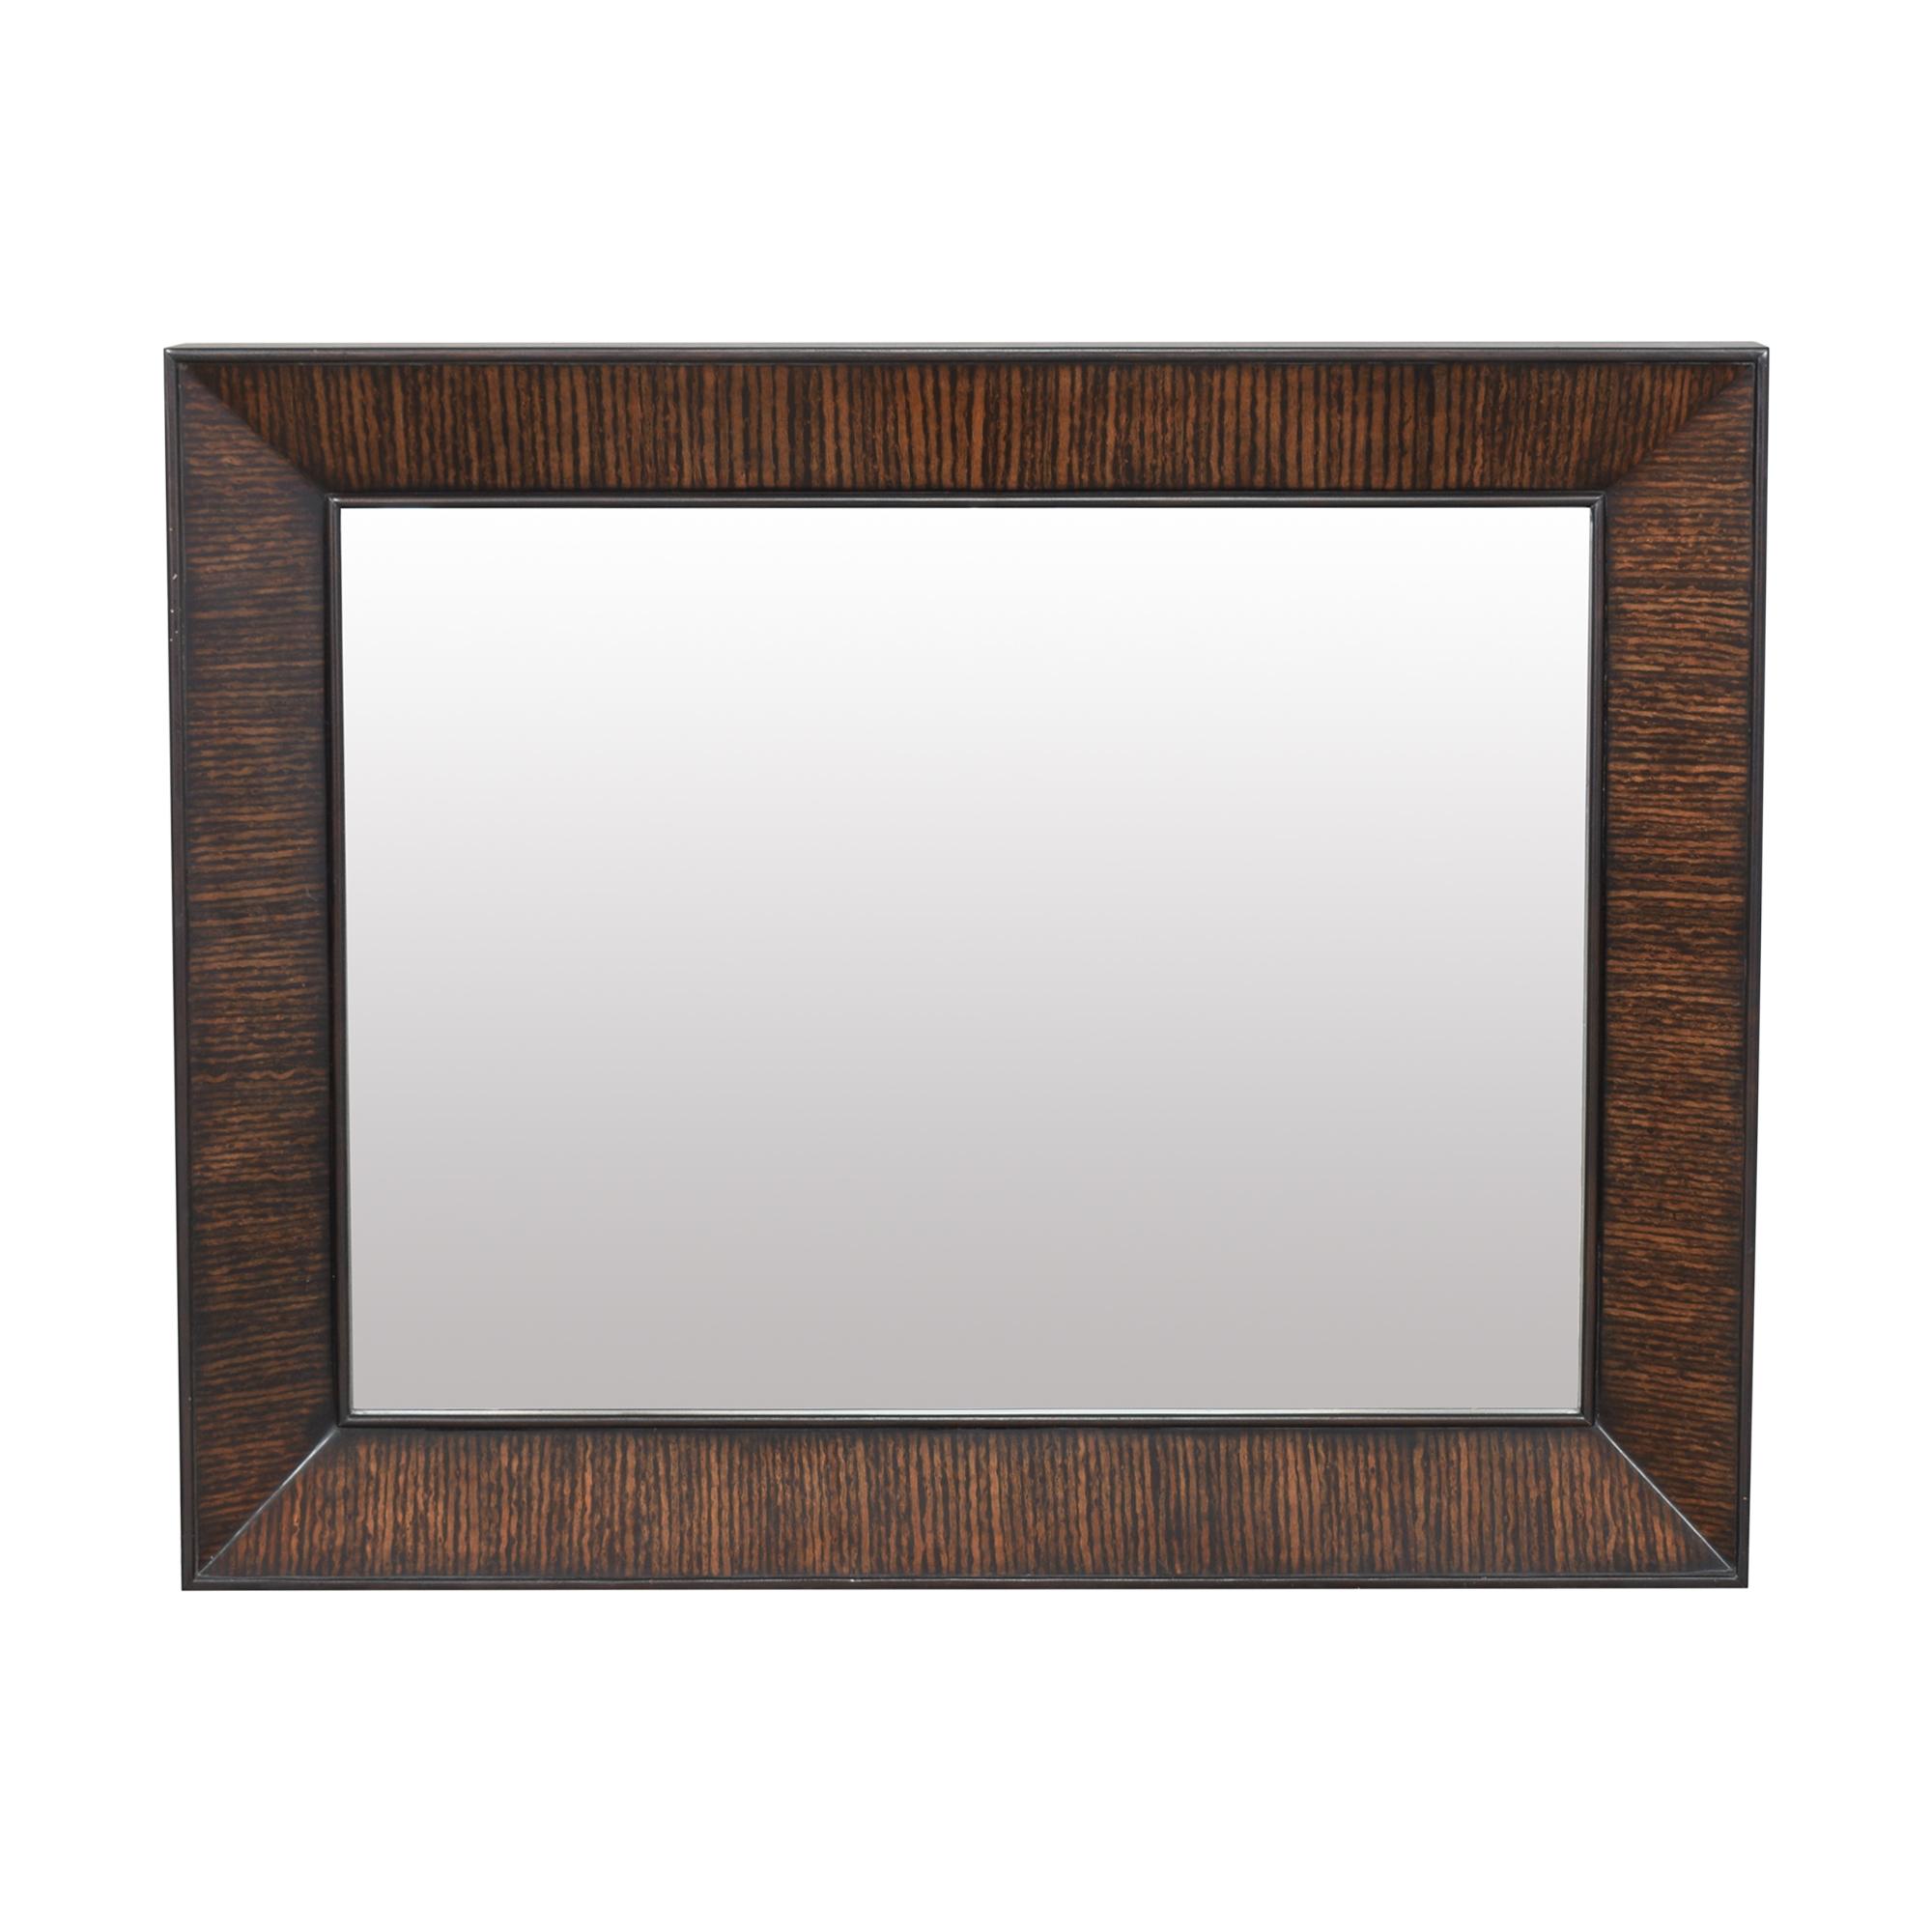 Kreiss Kreiss Coco Wall Mirror for sale